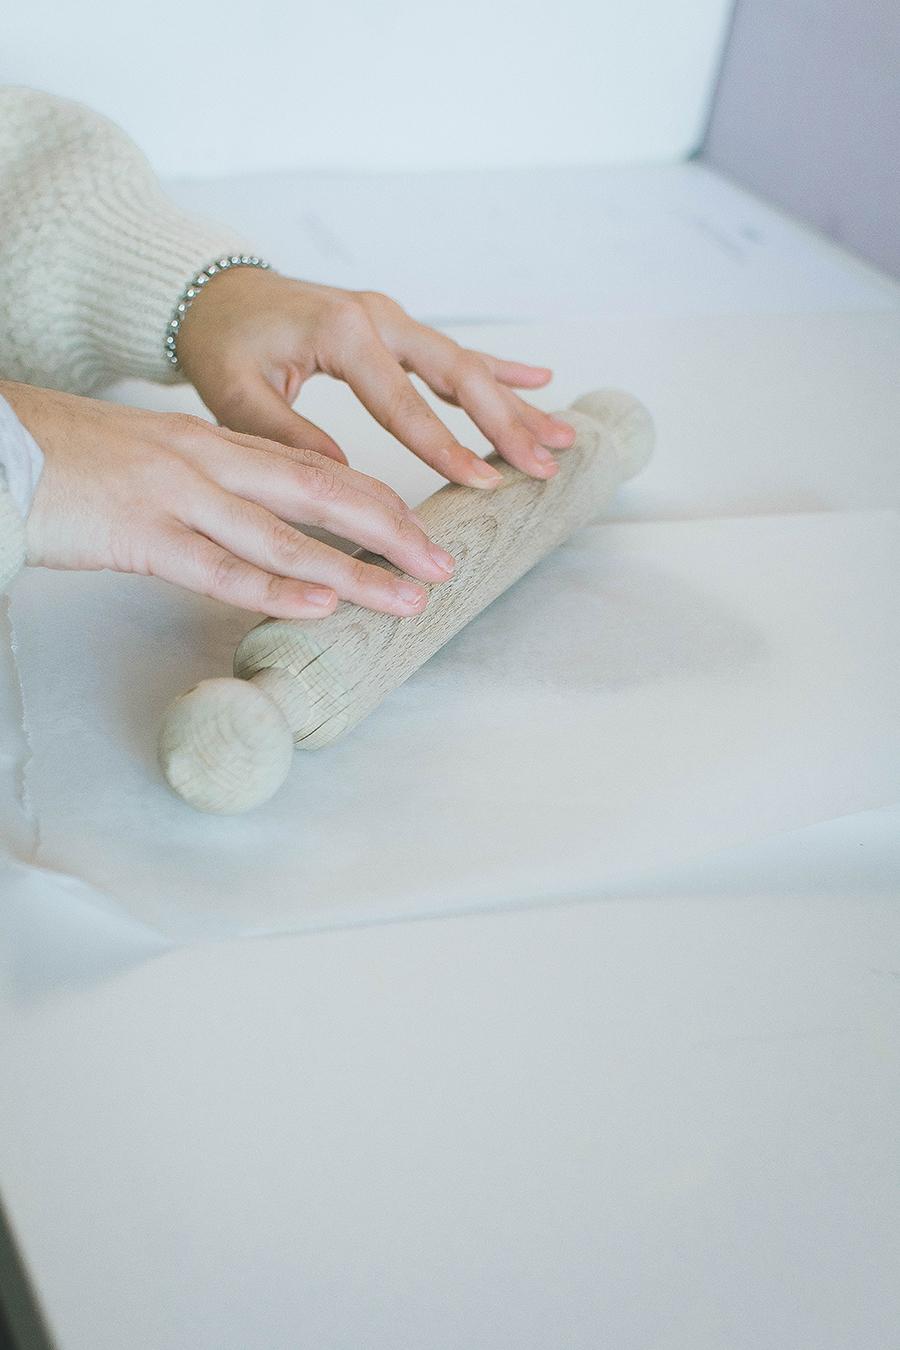 DIY Clay Gift Tags Process Tutorial